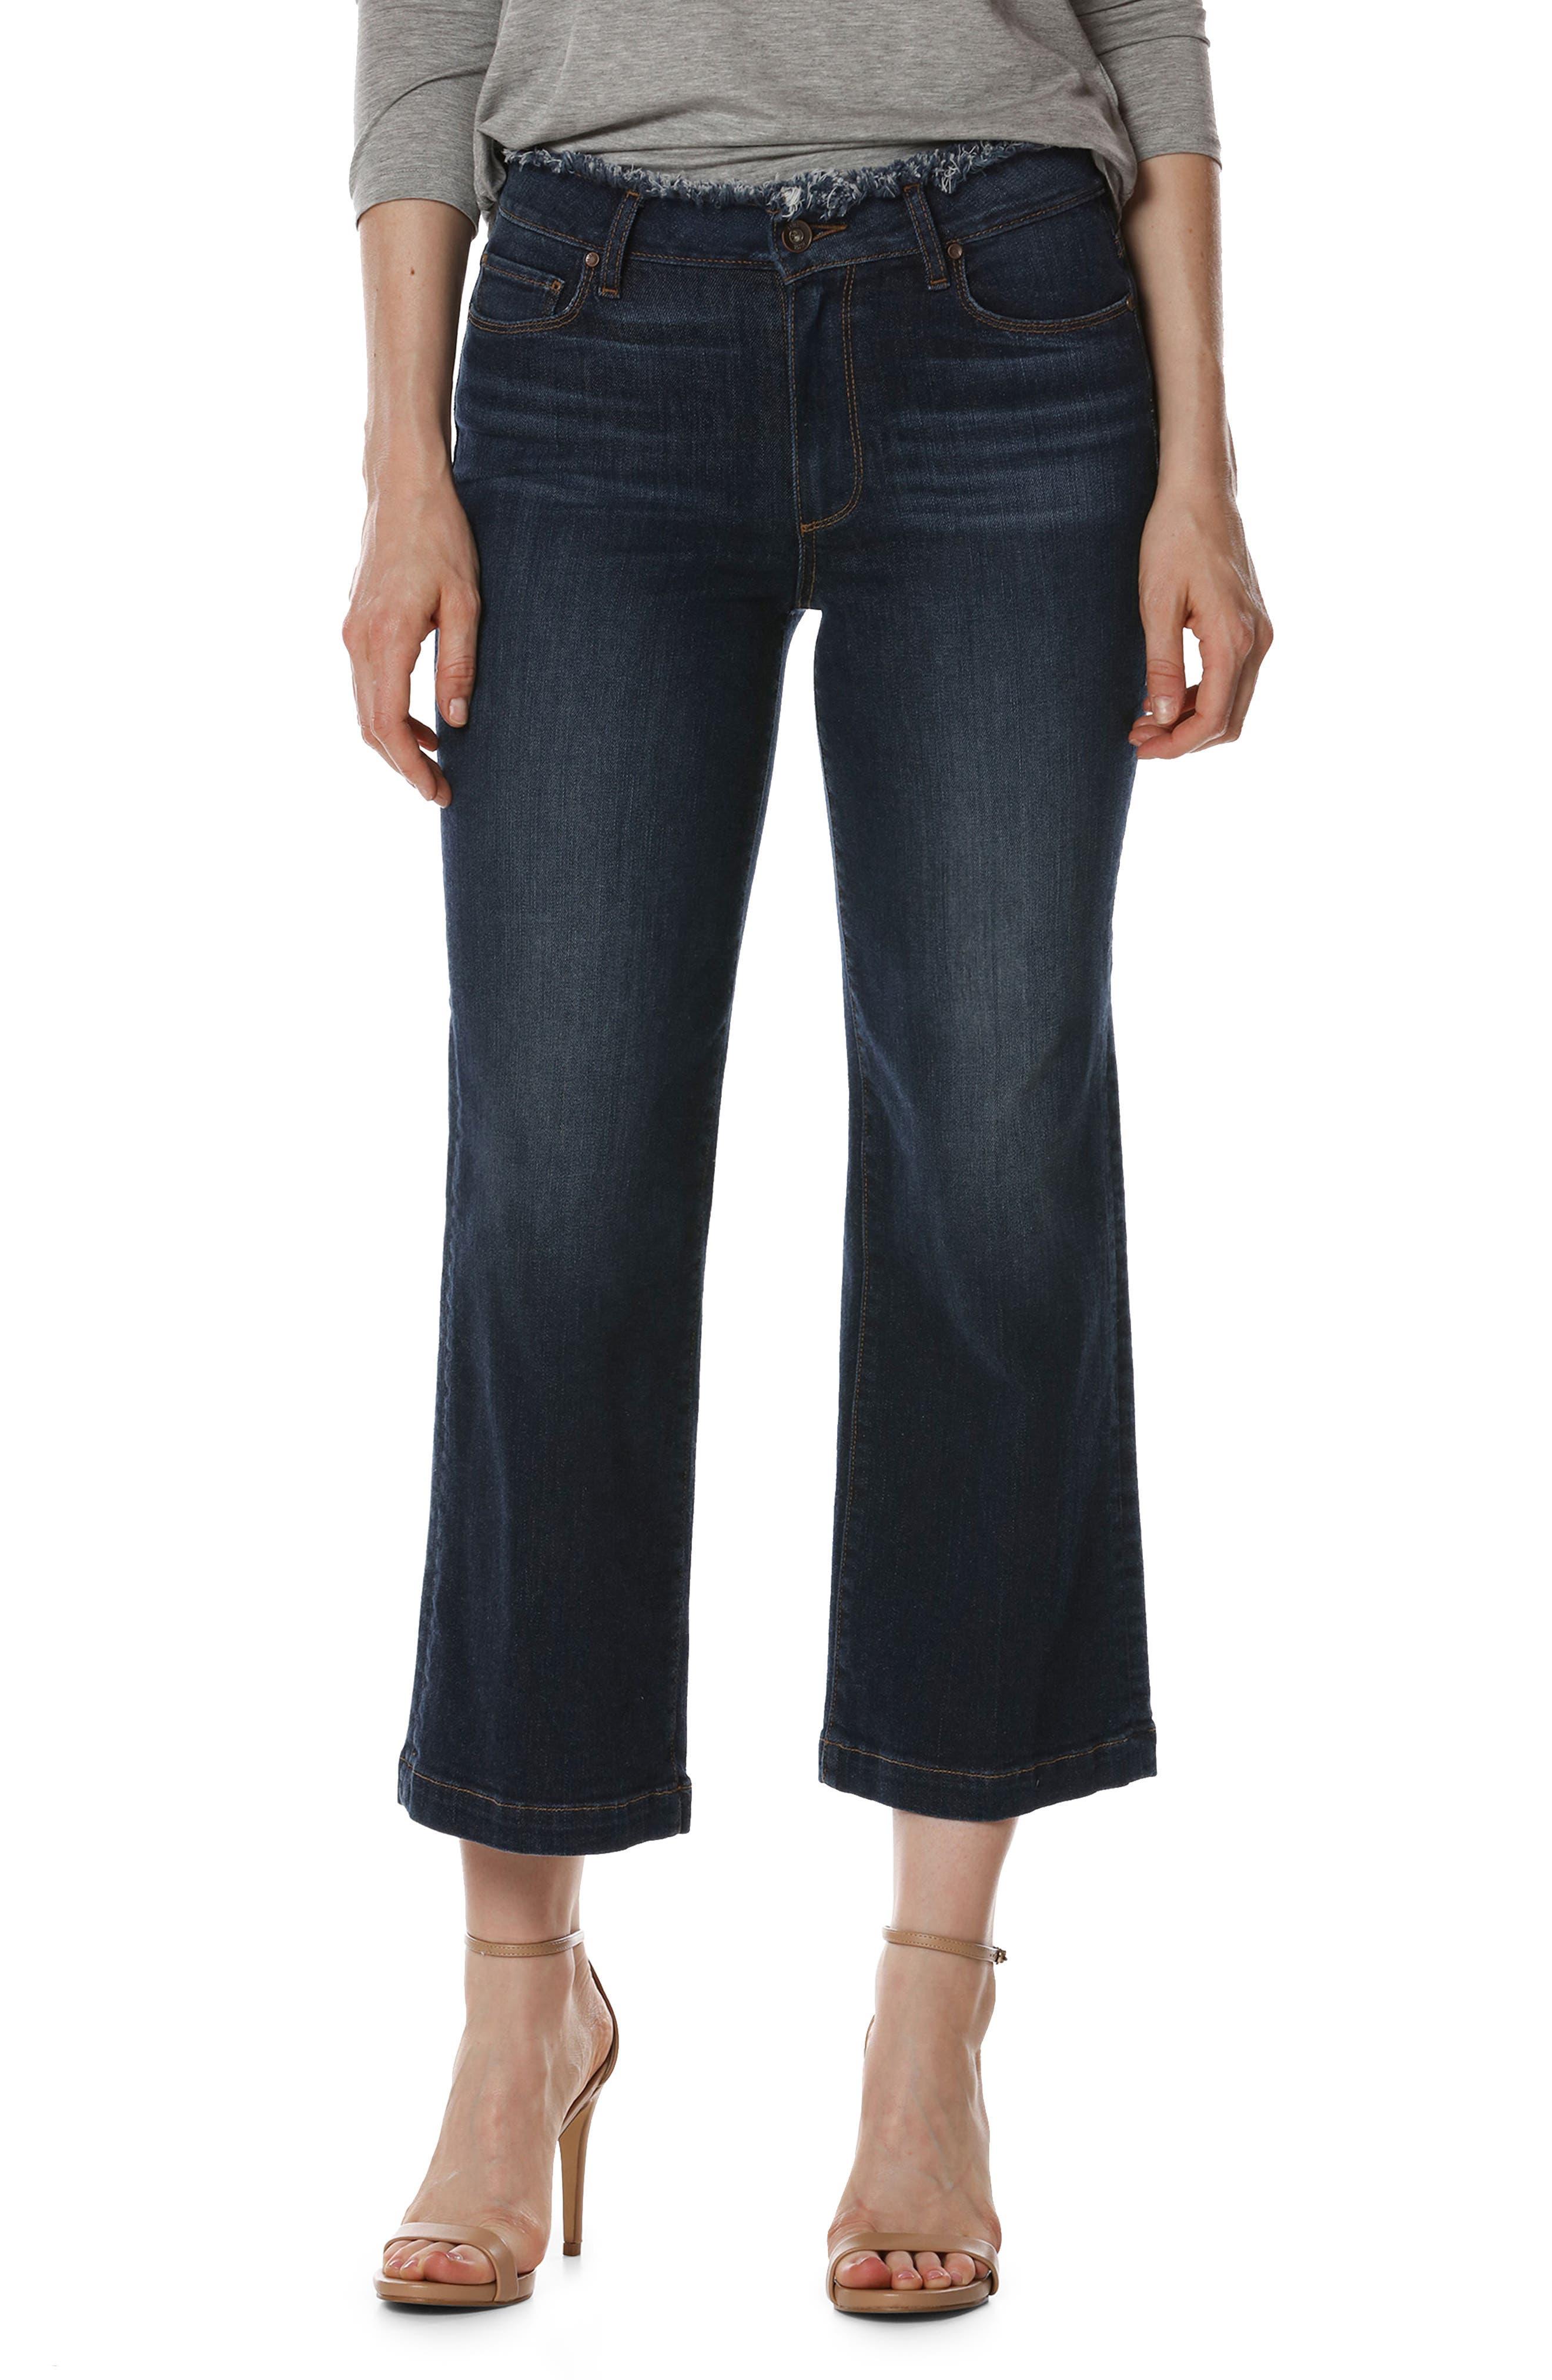 Alternate Image 1 Selected - PAIGE Lori Crop Wide Leg Jeans (Brookdale)